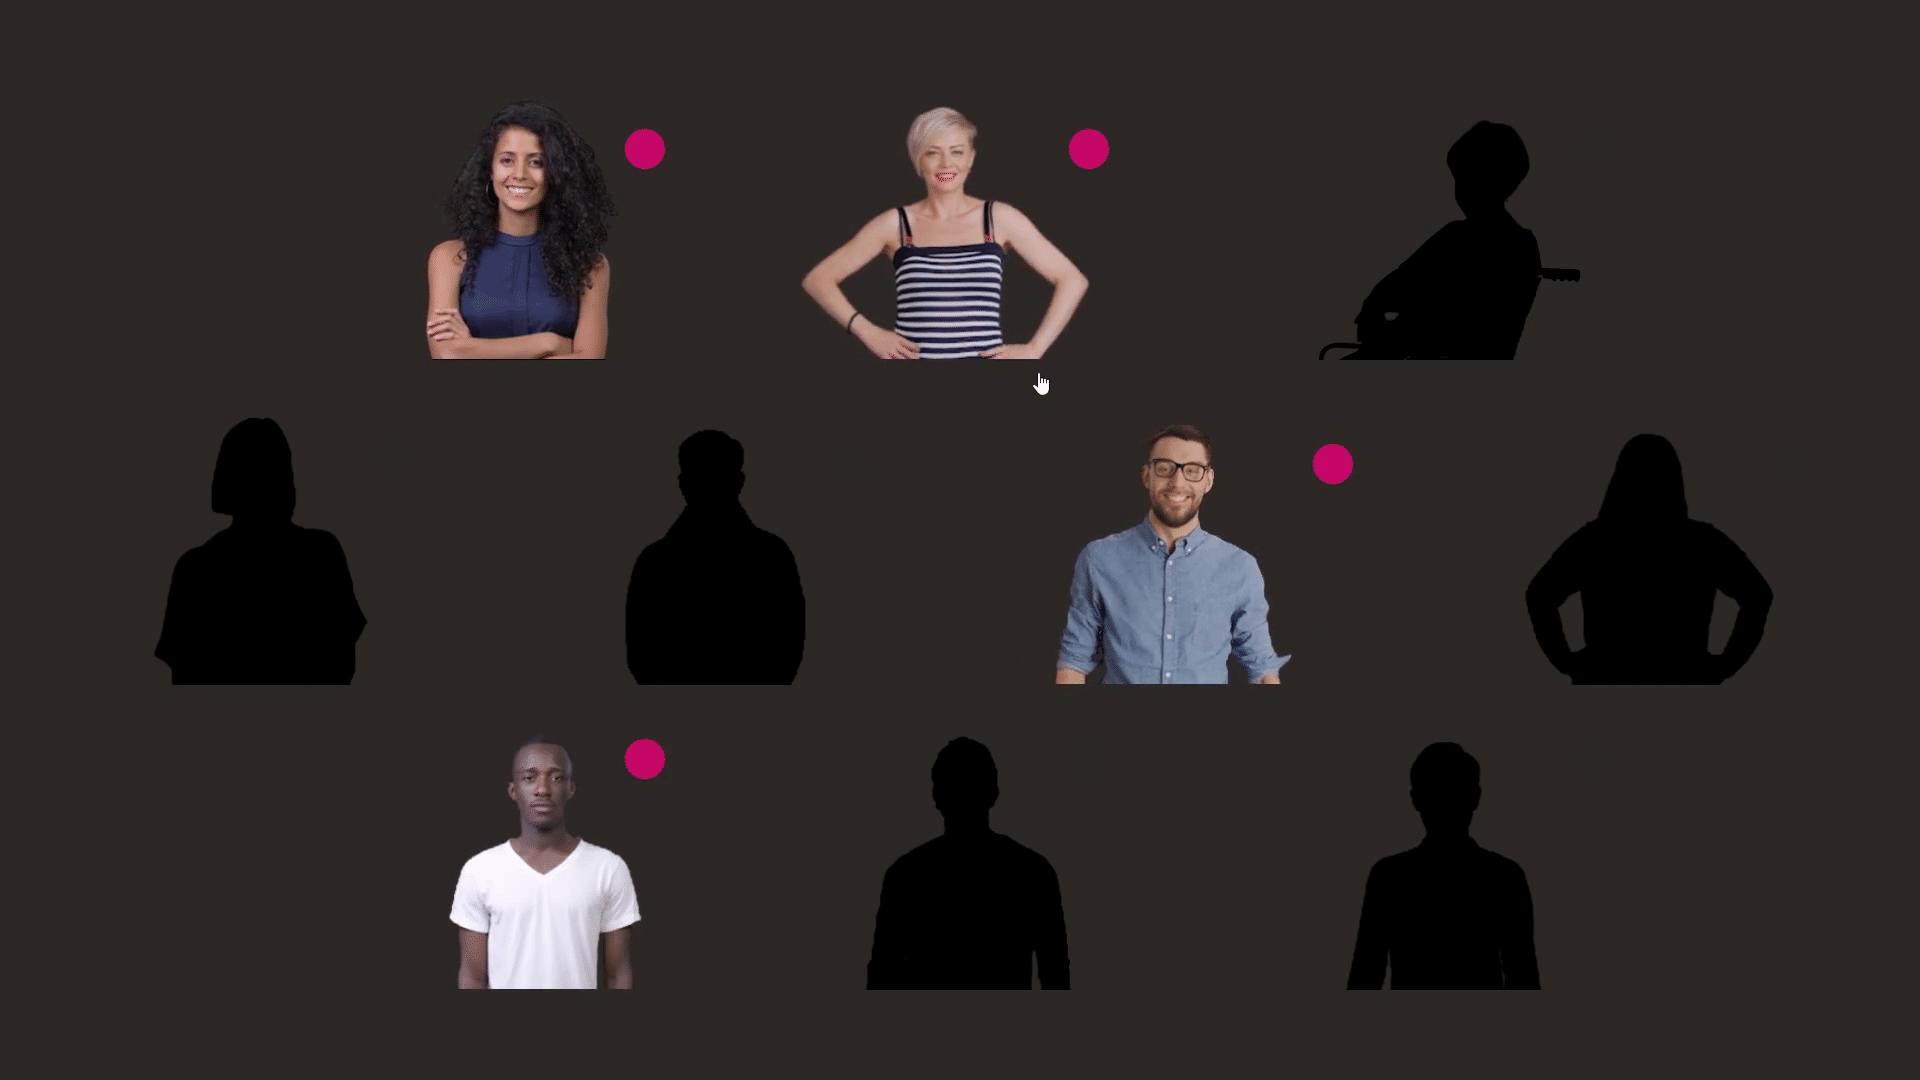 Unconscious bias training exercise- choose a person